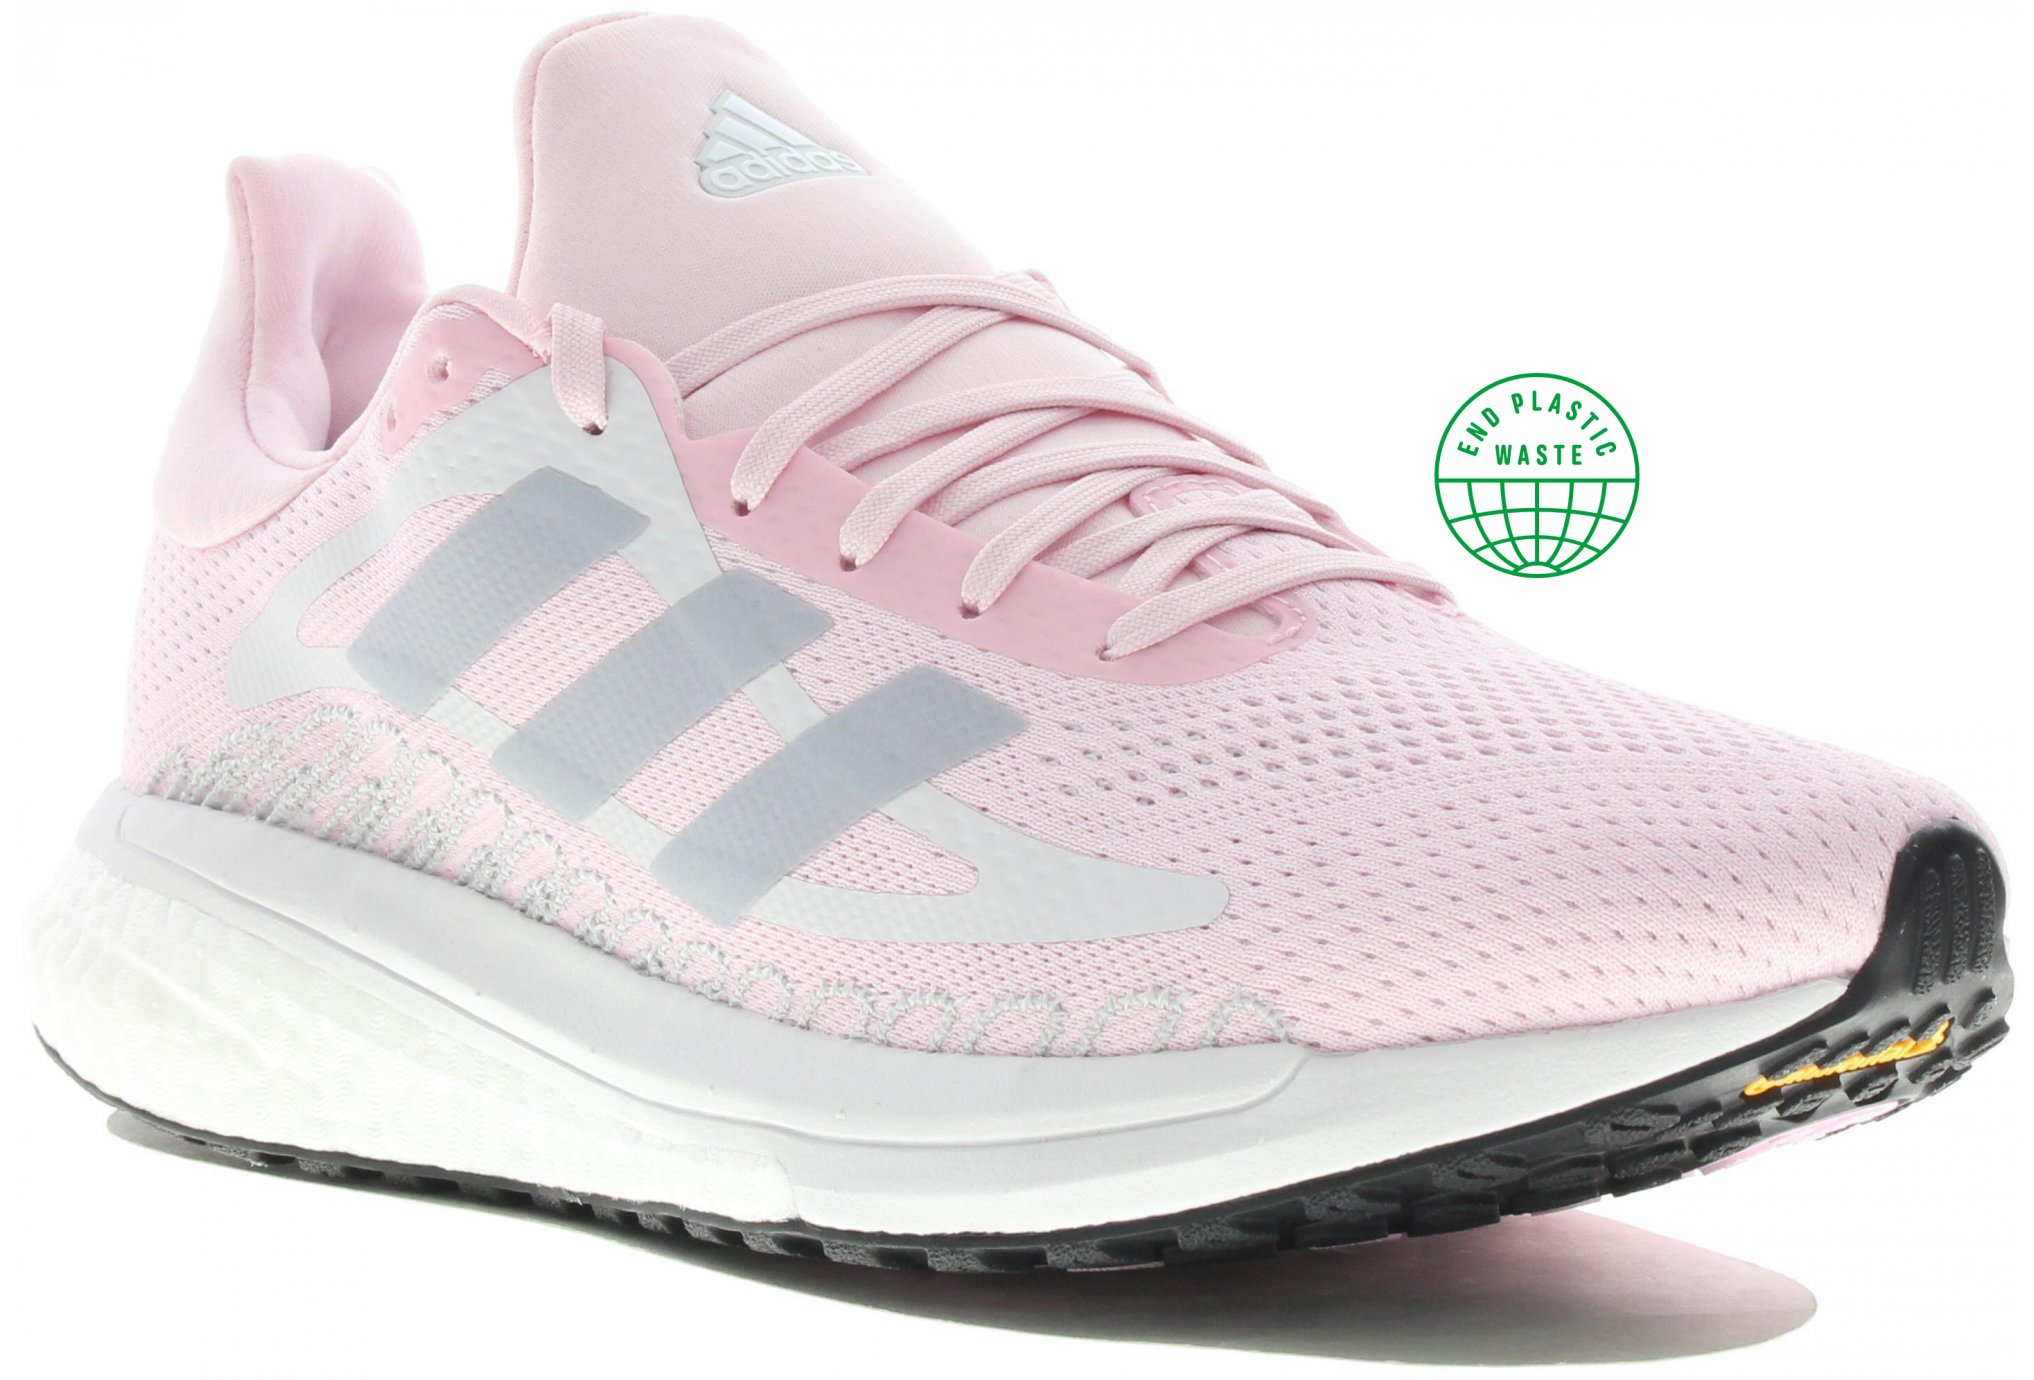 adidas SolarGlide ST 3 Primegreen W Chaussures running femme